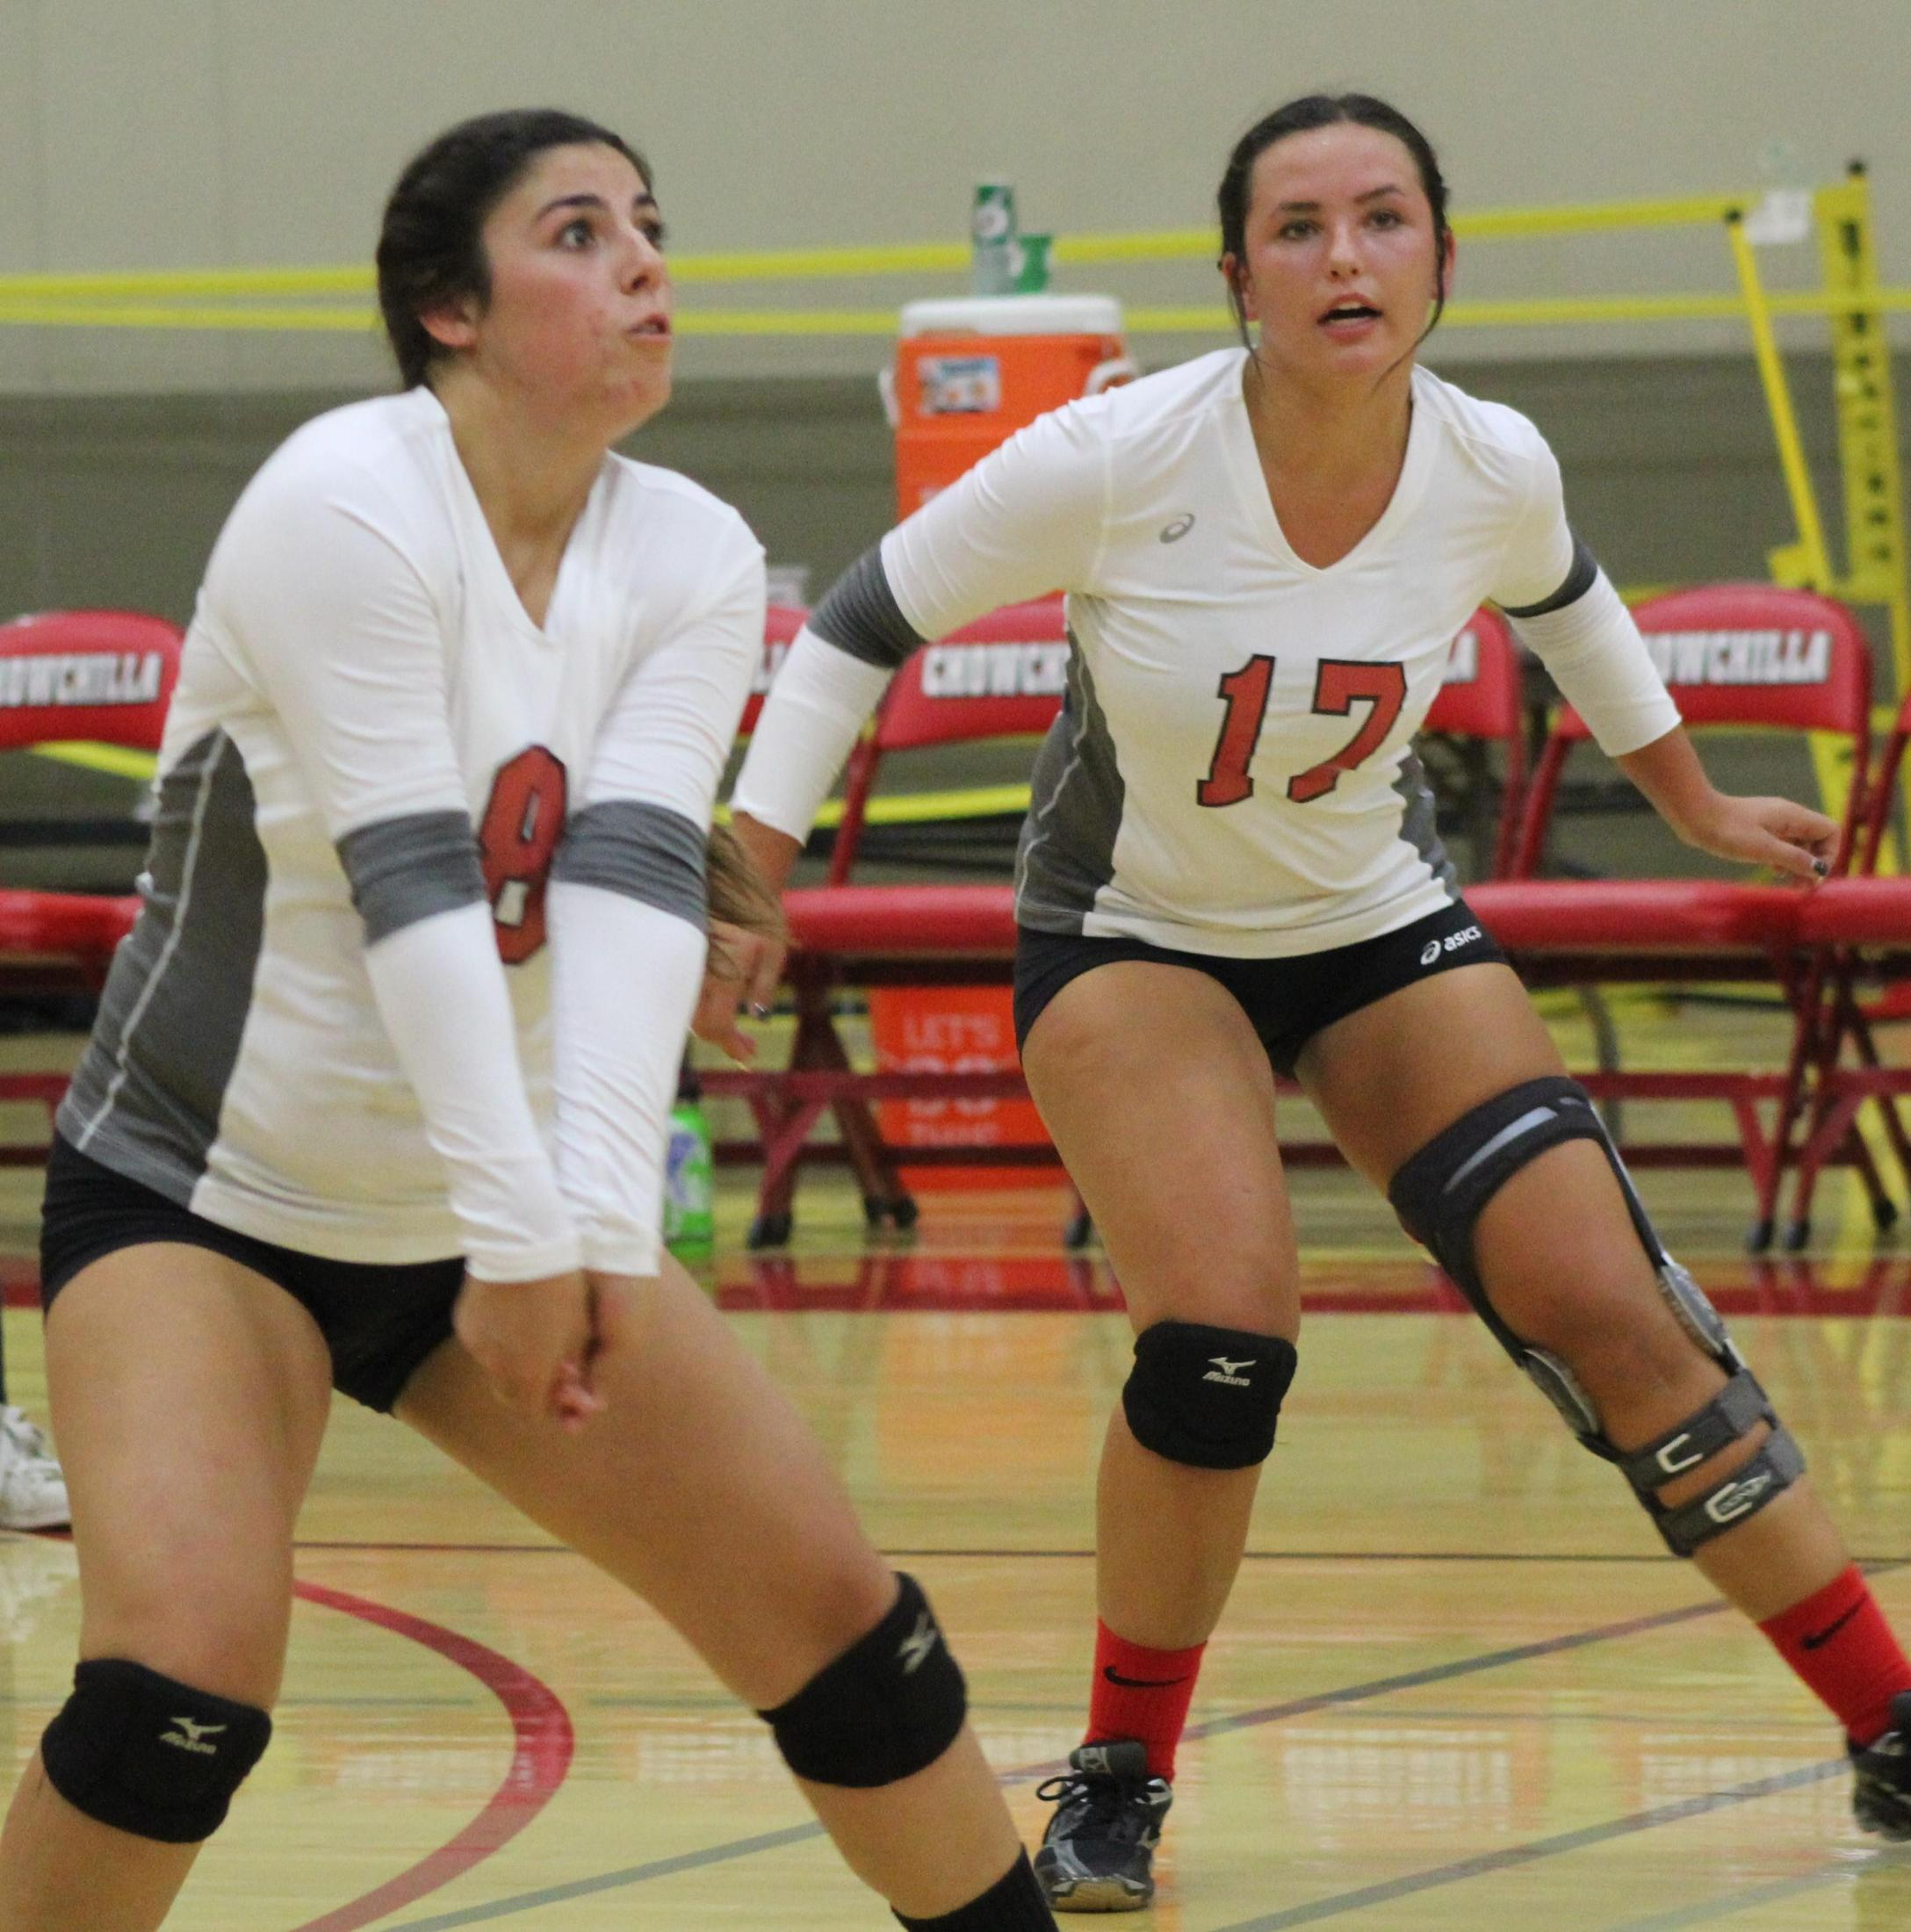 Varsity girls playing volleyball against Sierra